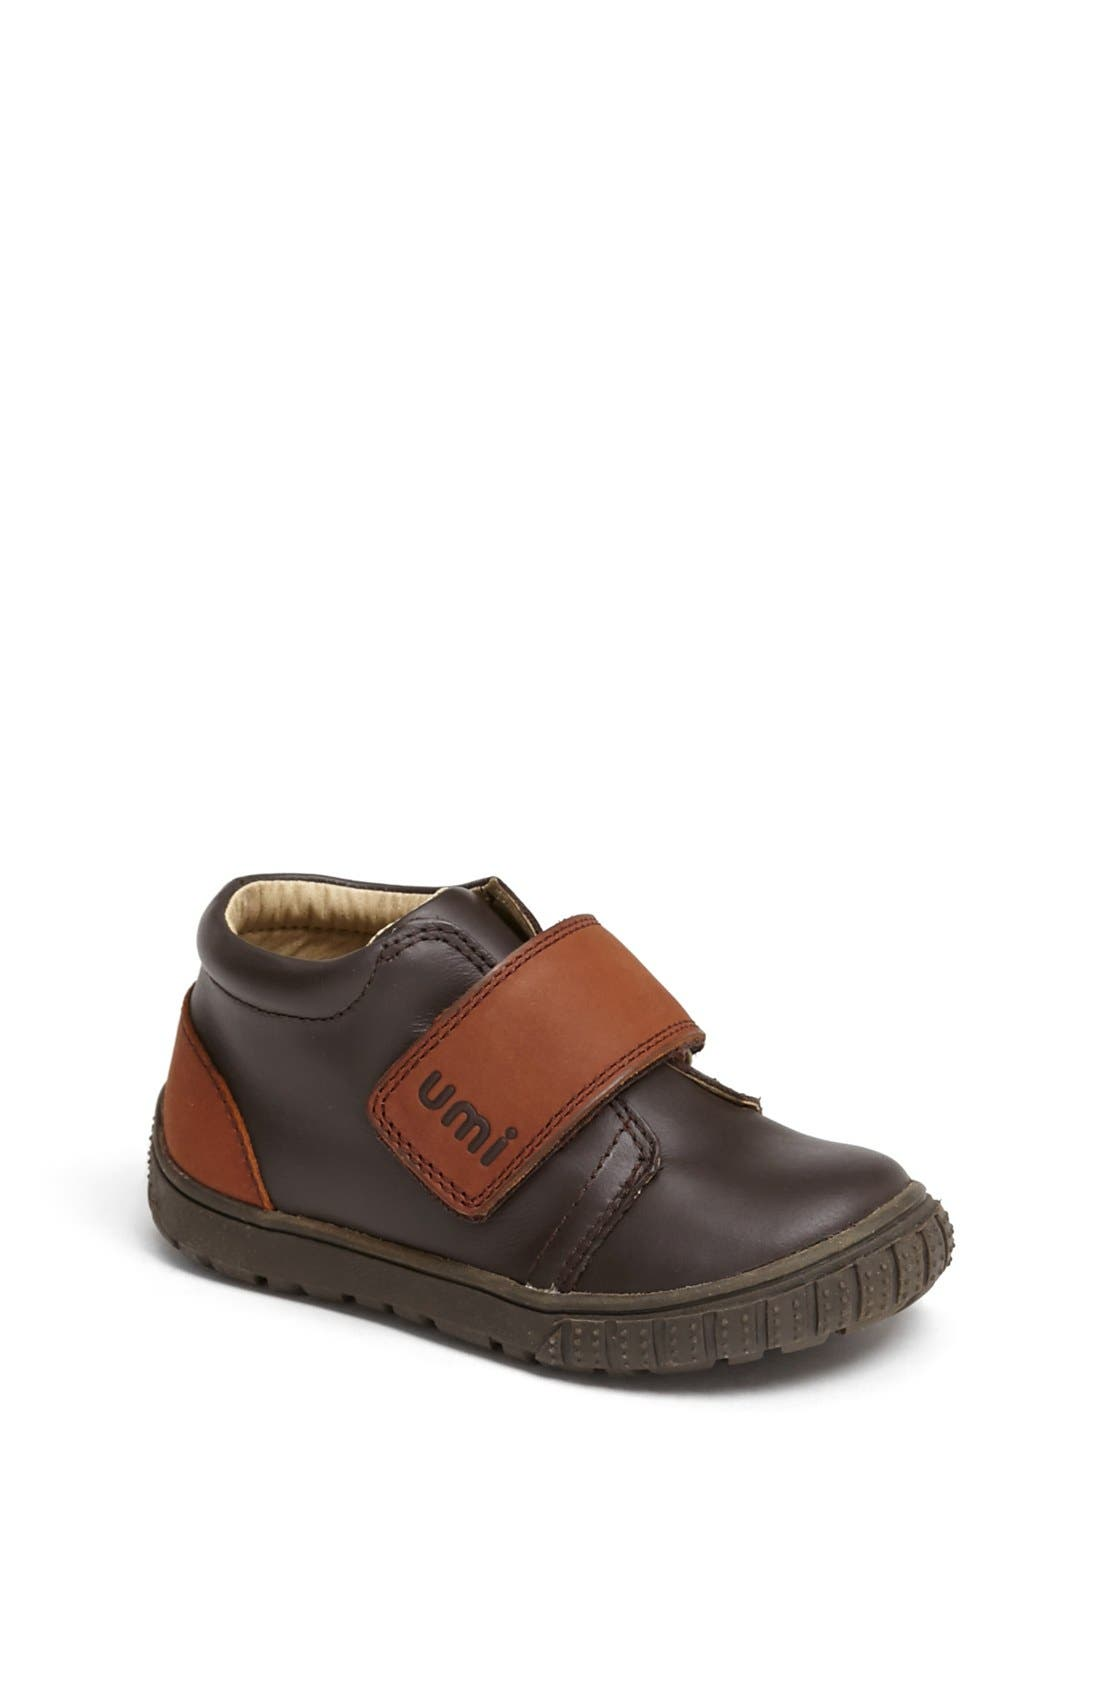 Main Image - Umi 'Bodi' Dress Boot (Walker & Toddler)